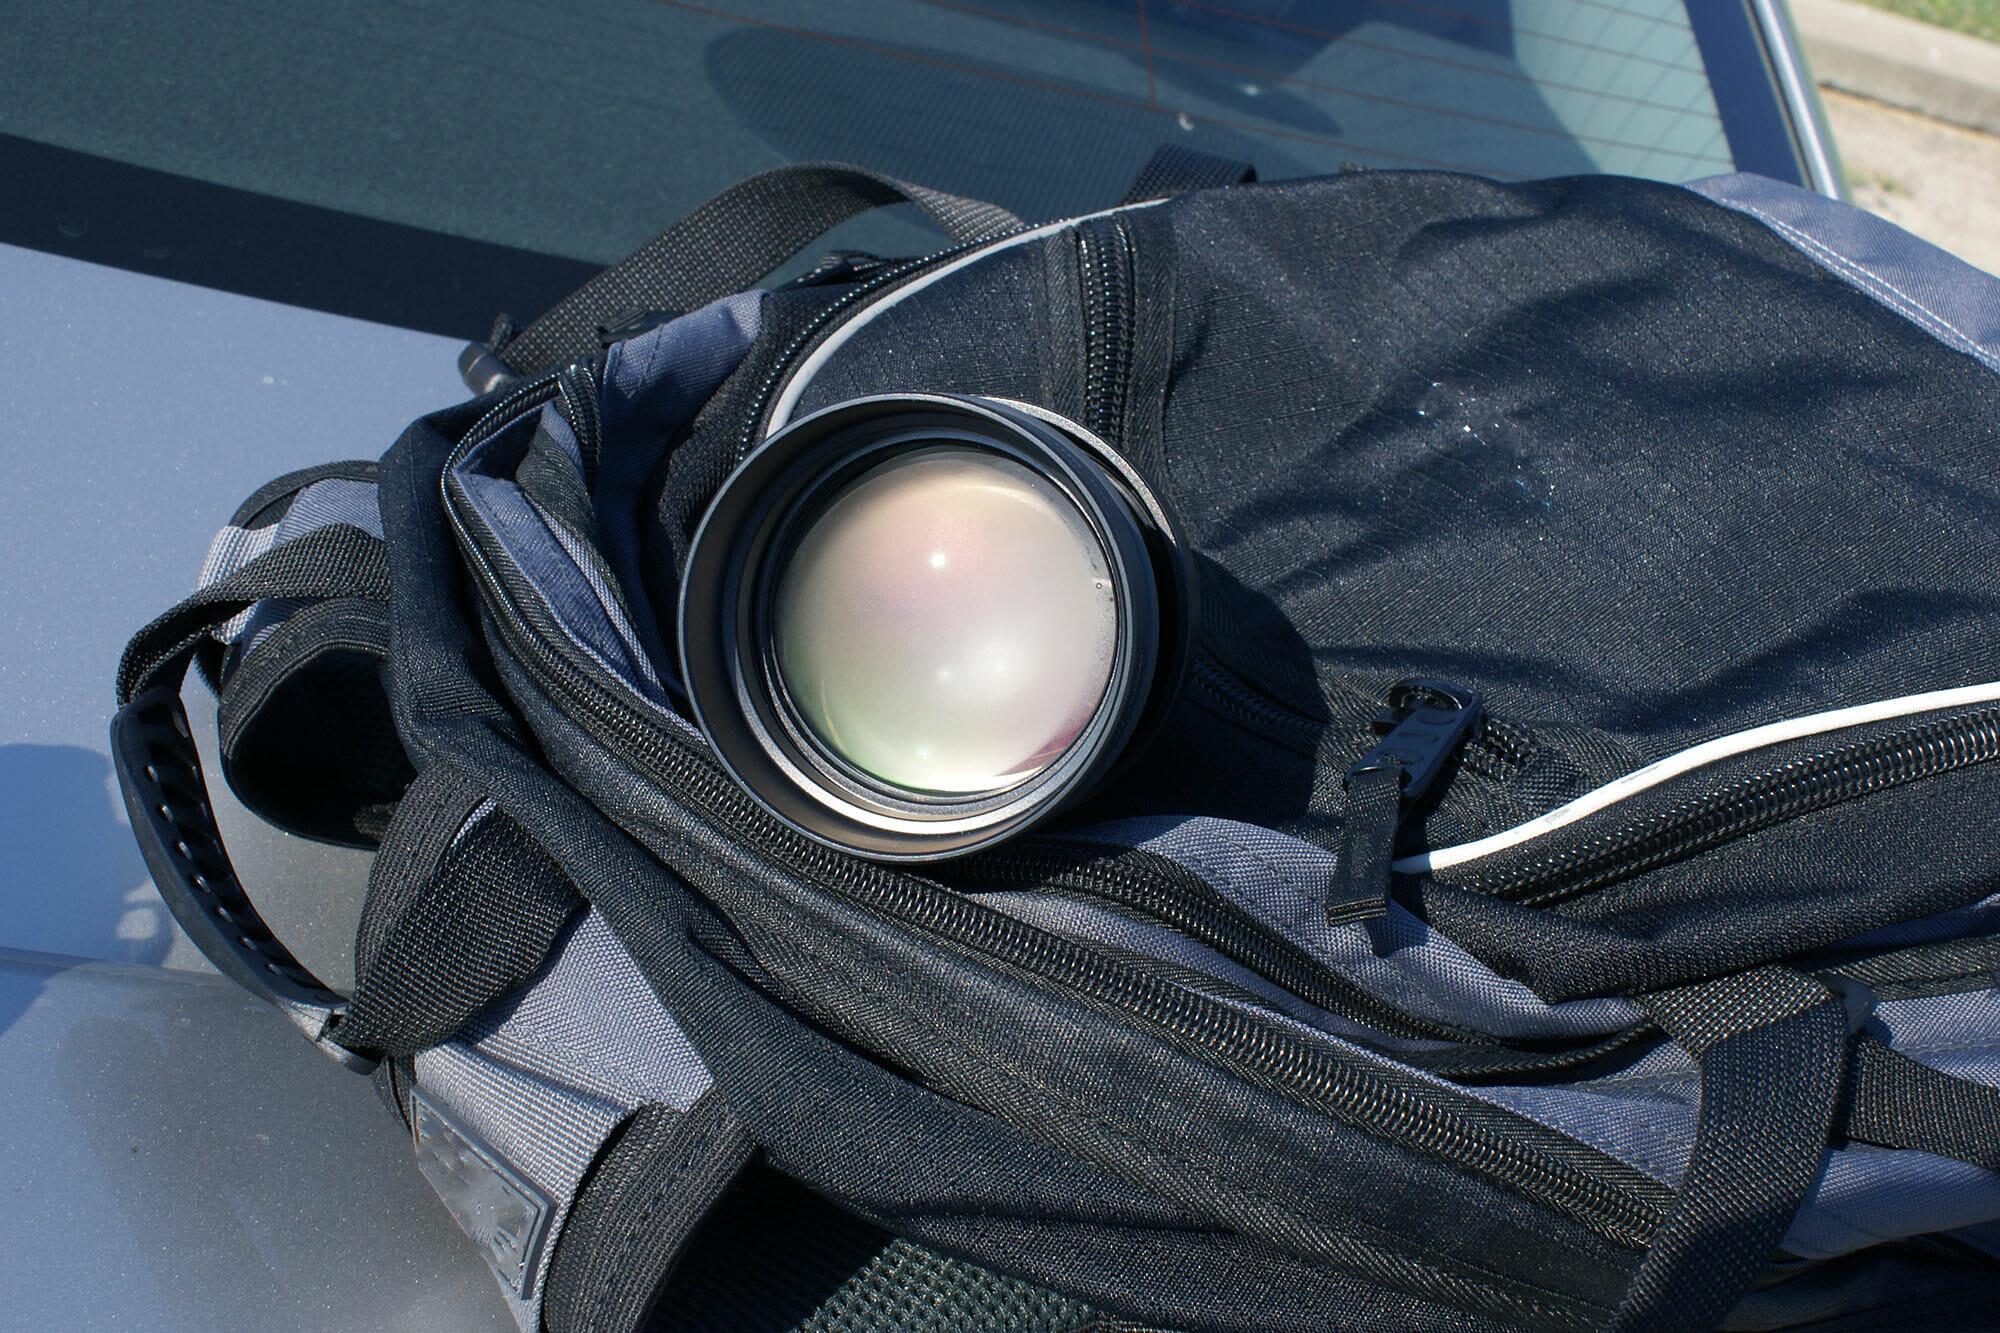 camera condensation lens cold bag